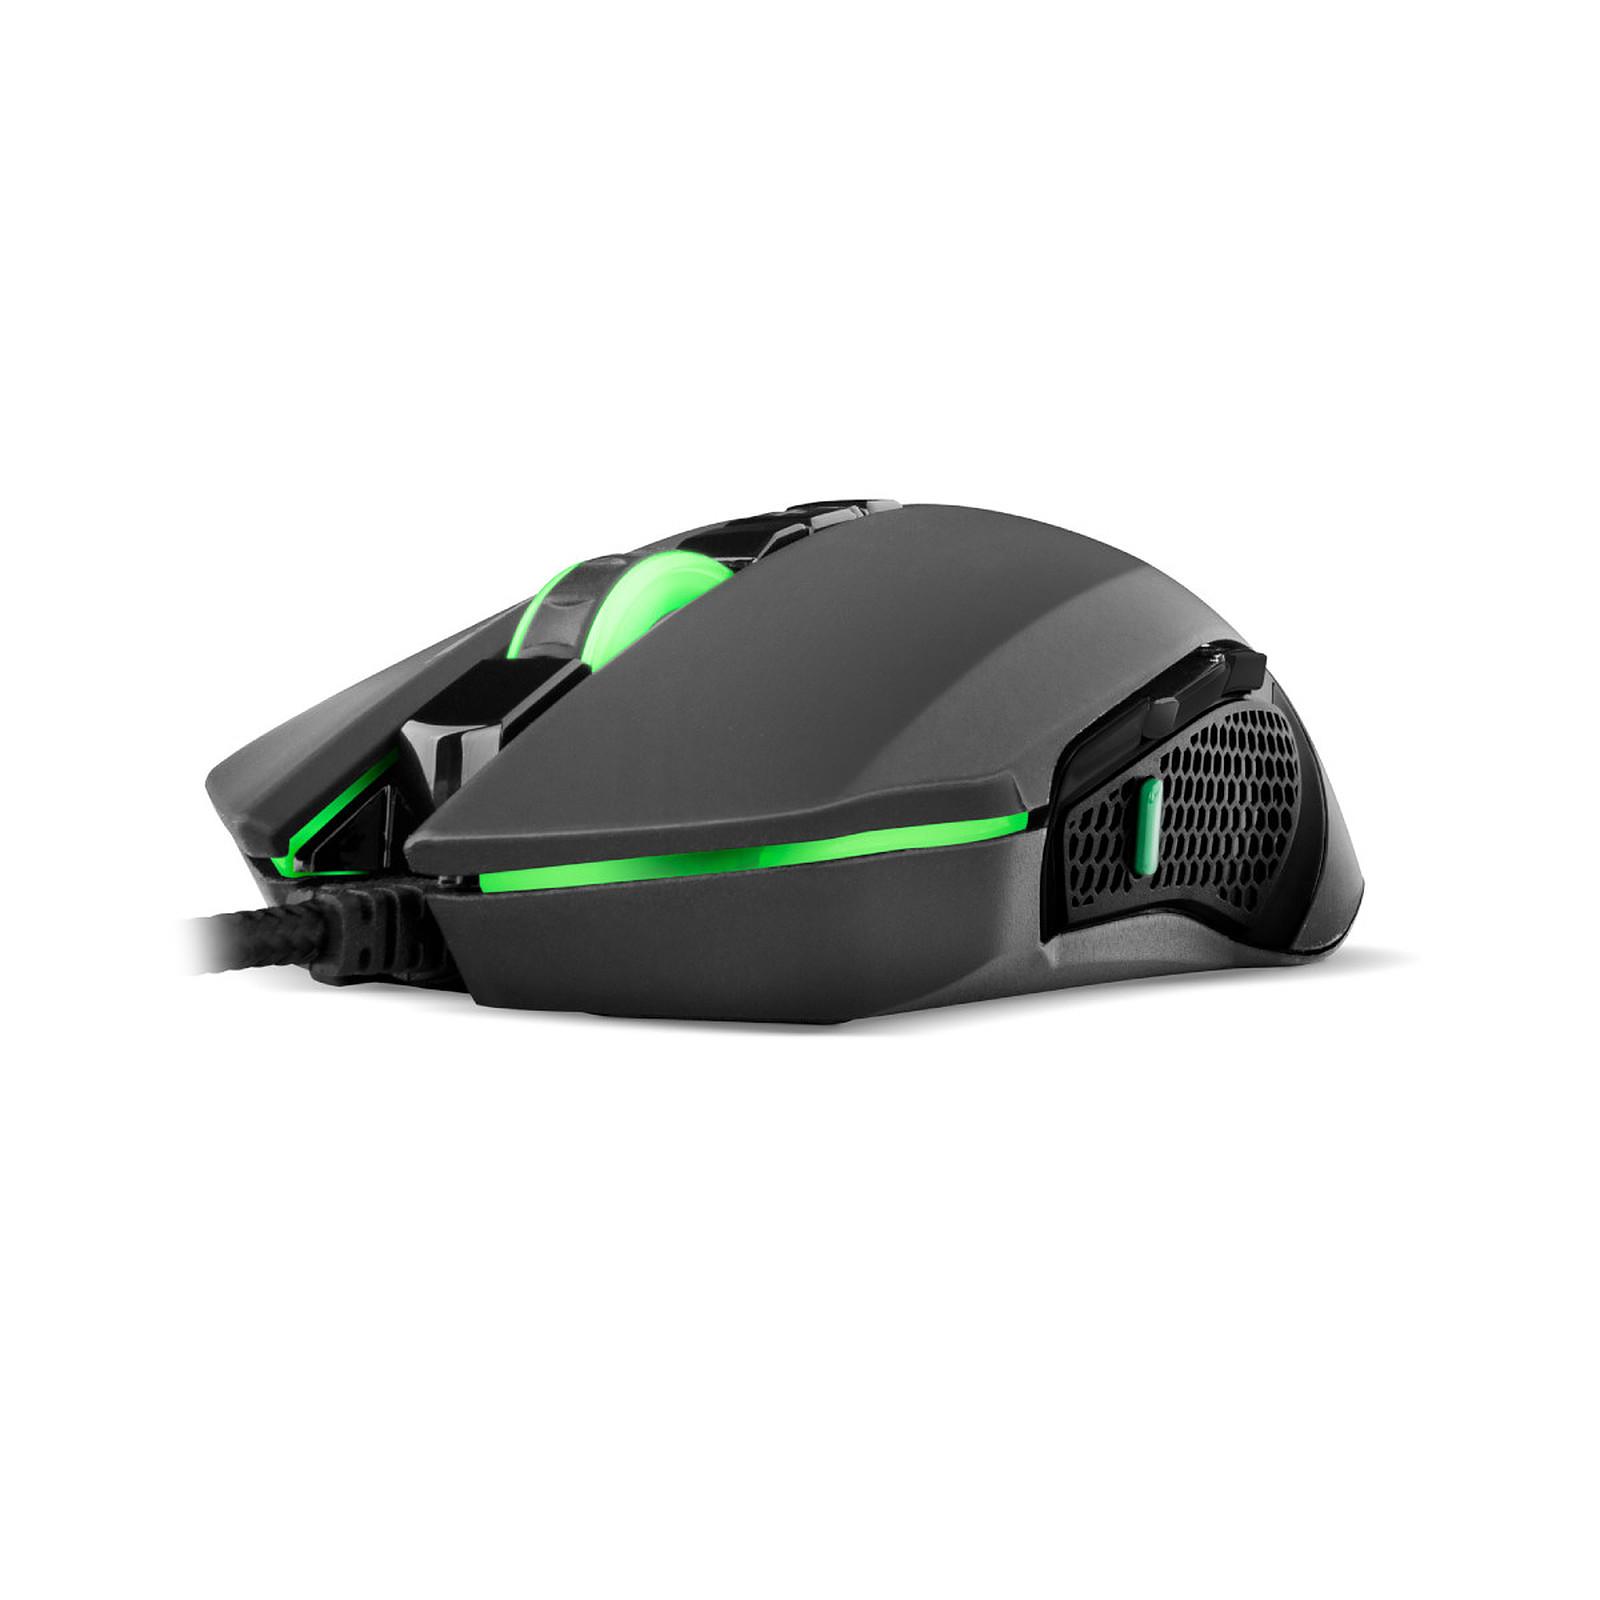 Ratón gaming BG Hunter óptico 3200 DPI